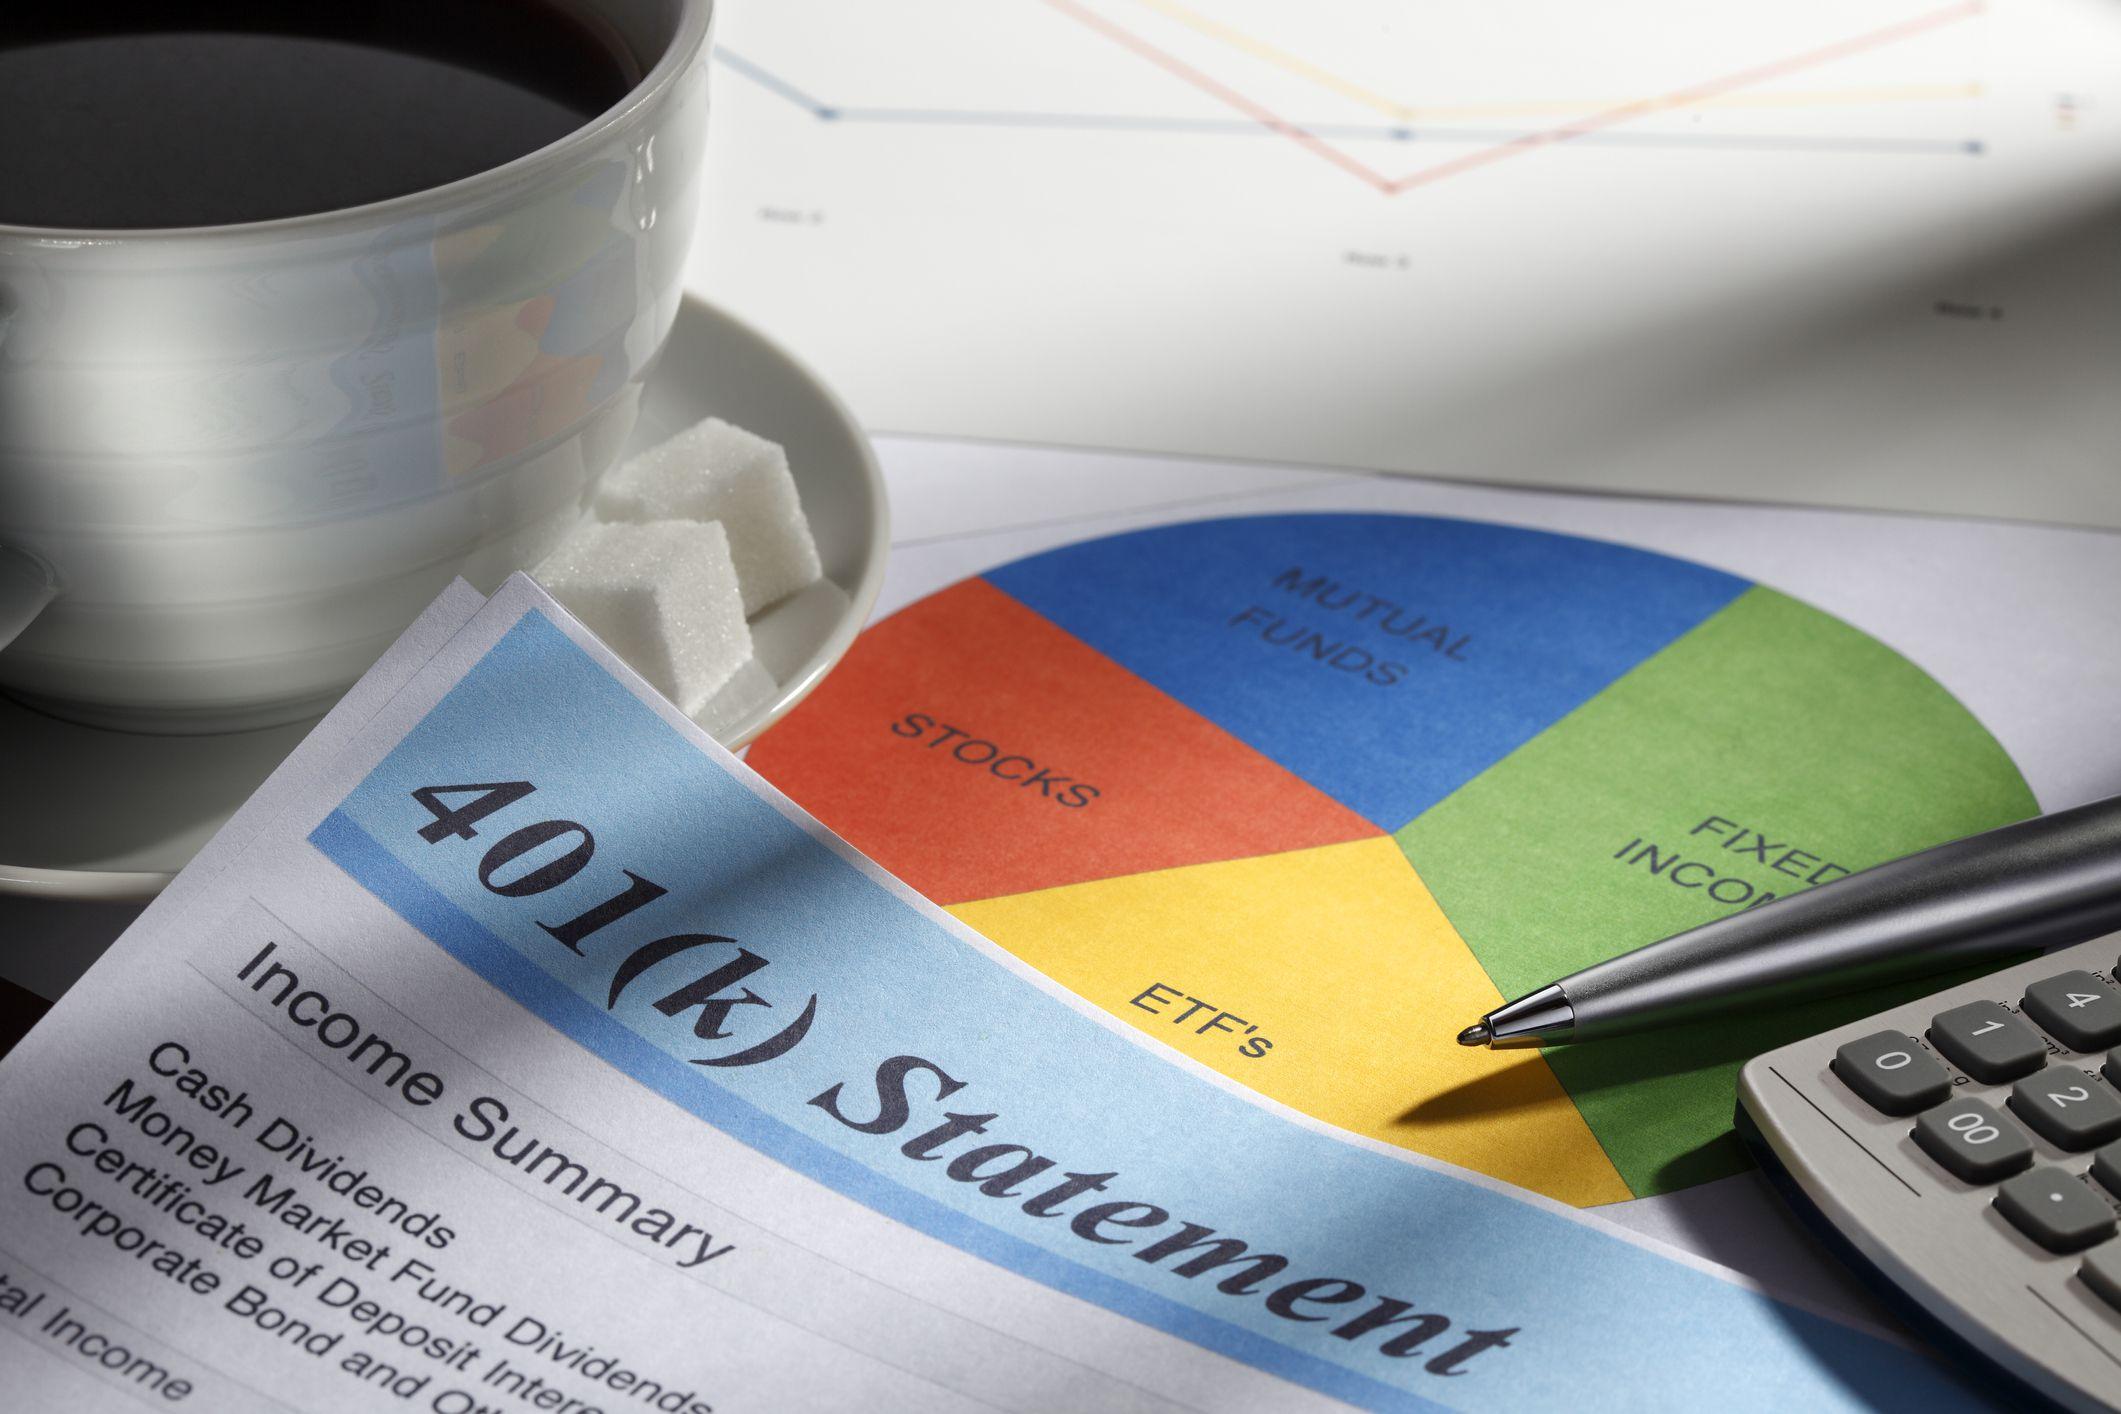 The Basics of a 401(k) Retirement Plan